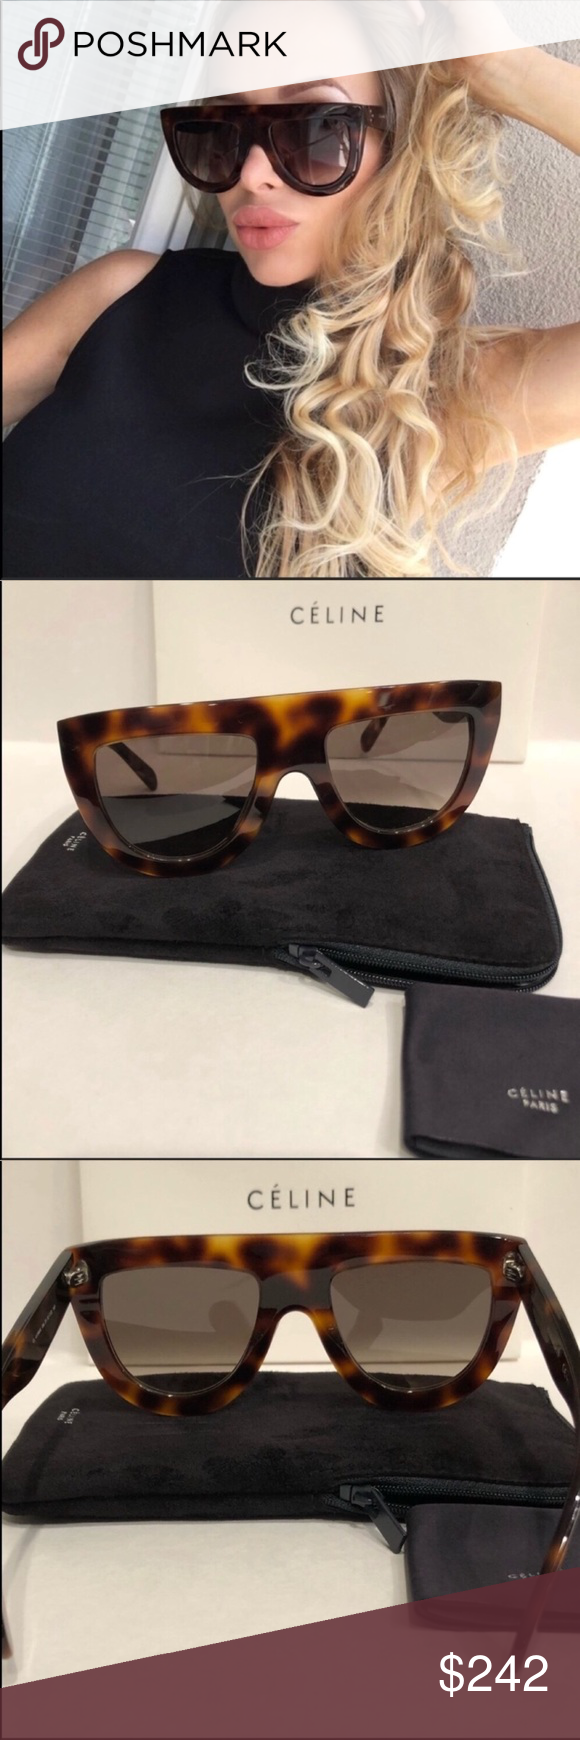 9028d9276972 Celine sunglasses 😎 Celine 41398 s Andrea Havana Brown sunglasses New  condition. 100%